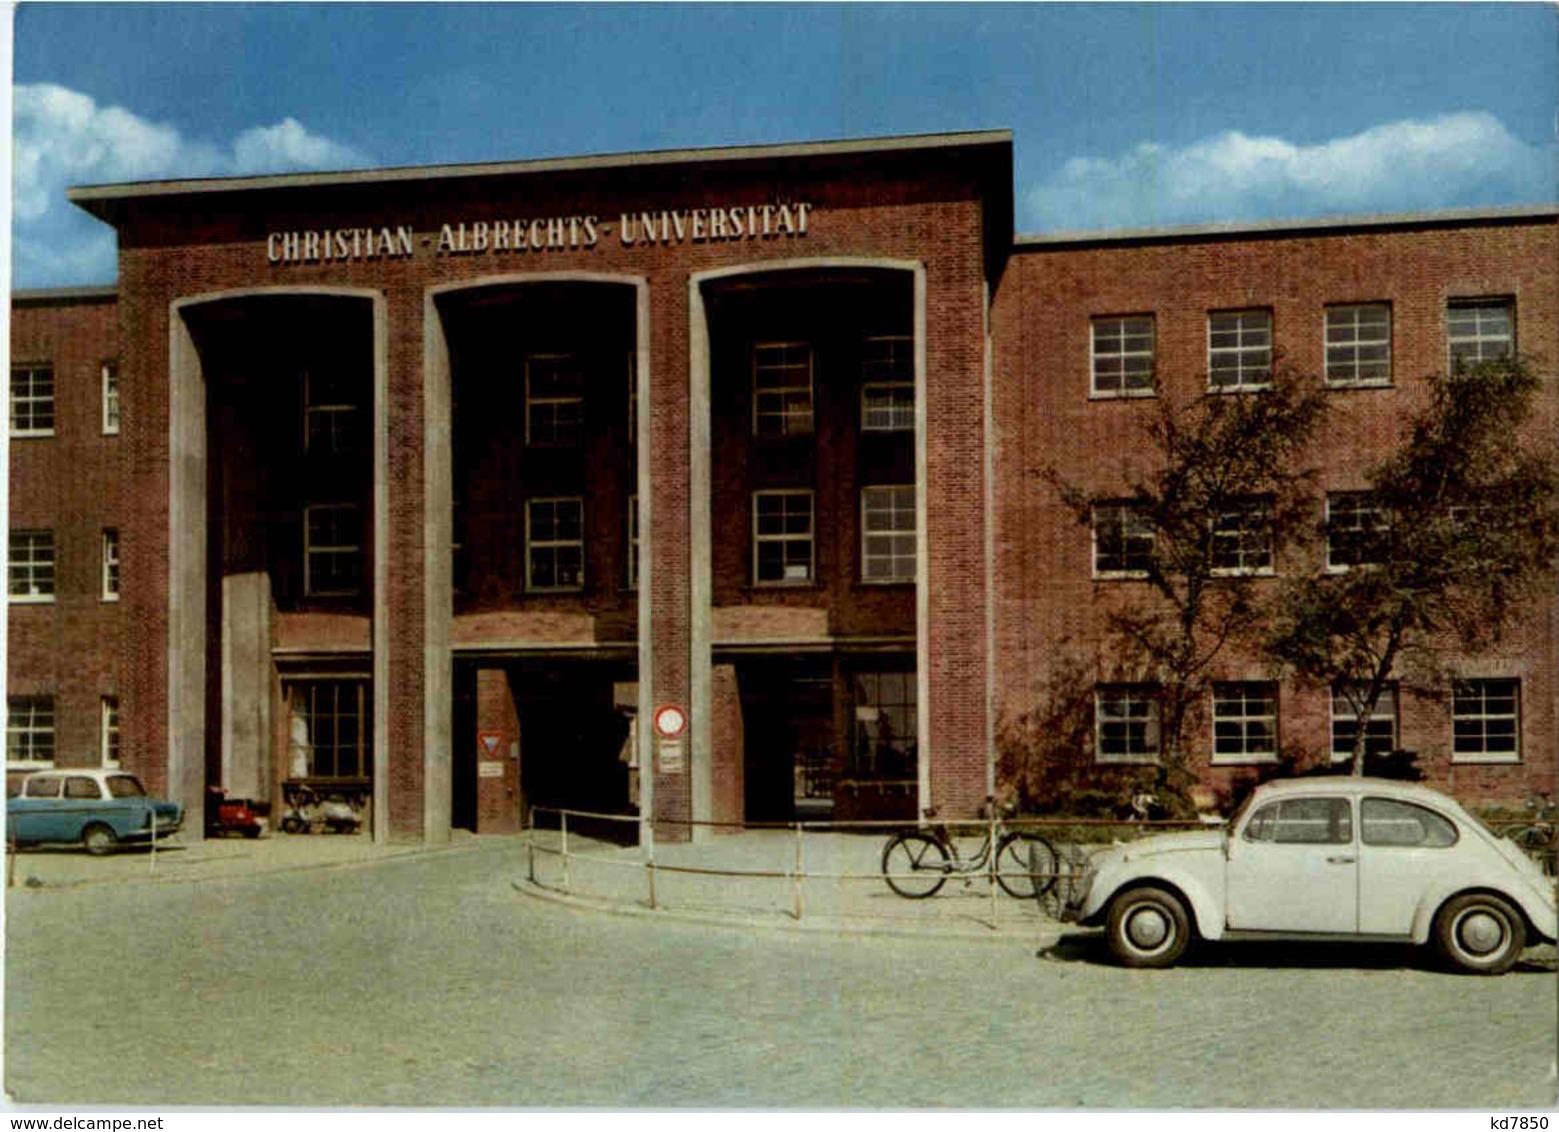 Kiel - Christian Albrechts Universität - VW Käfer - Kiel